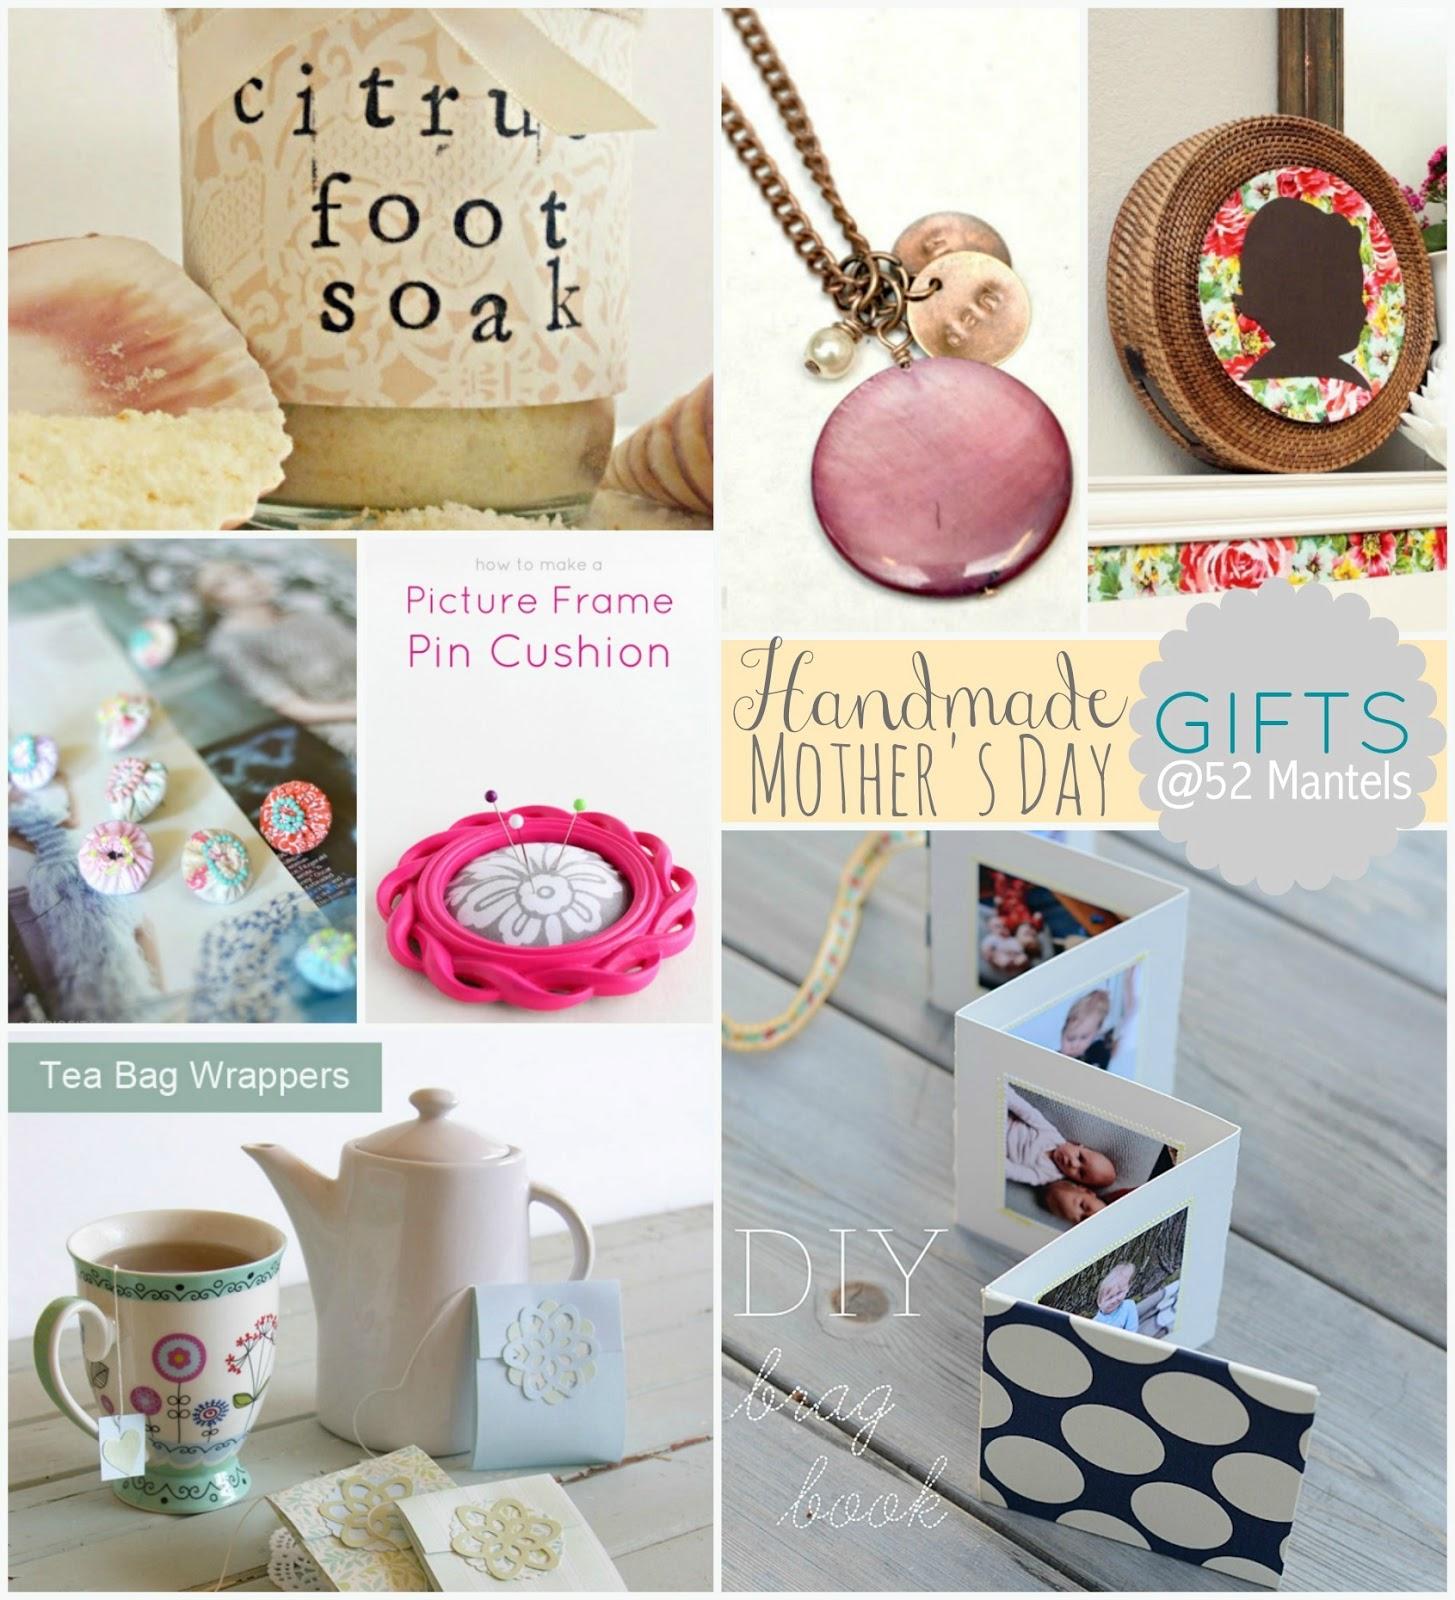 Handmade Gift Ideas: 52 Mantels: Handmade Mother's Day Gift Ideas